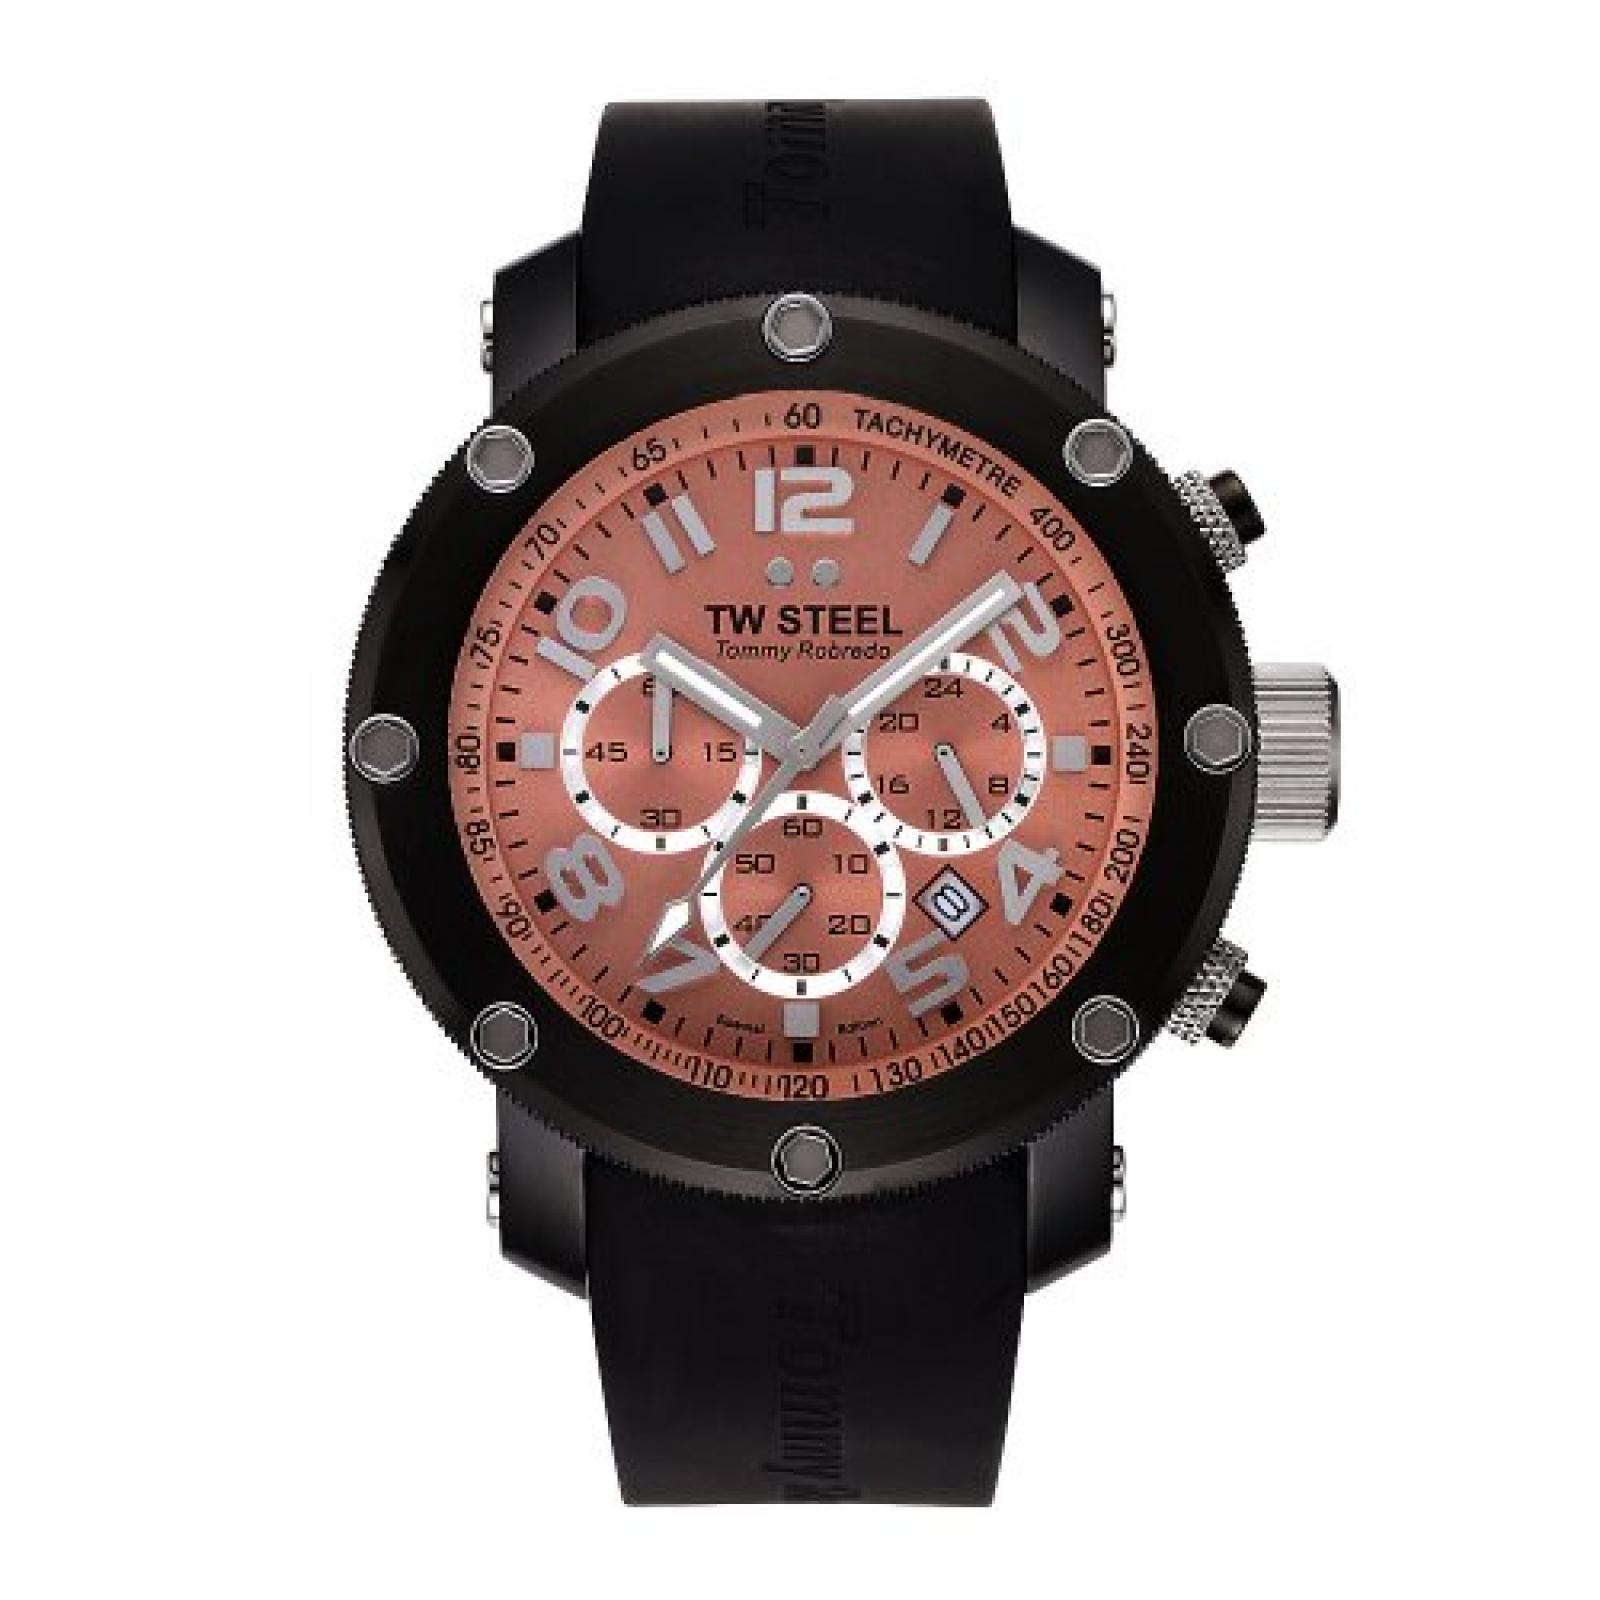 TW-STEEL Armbanduhr TECH Robredo TW-106